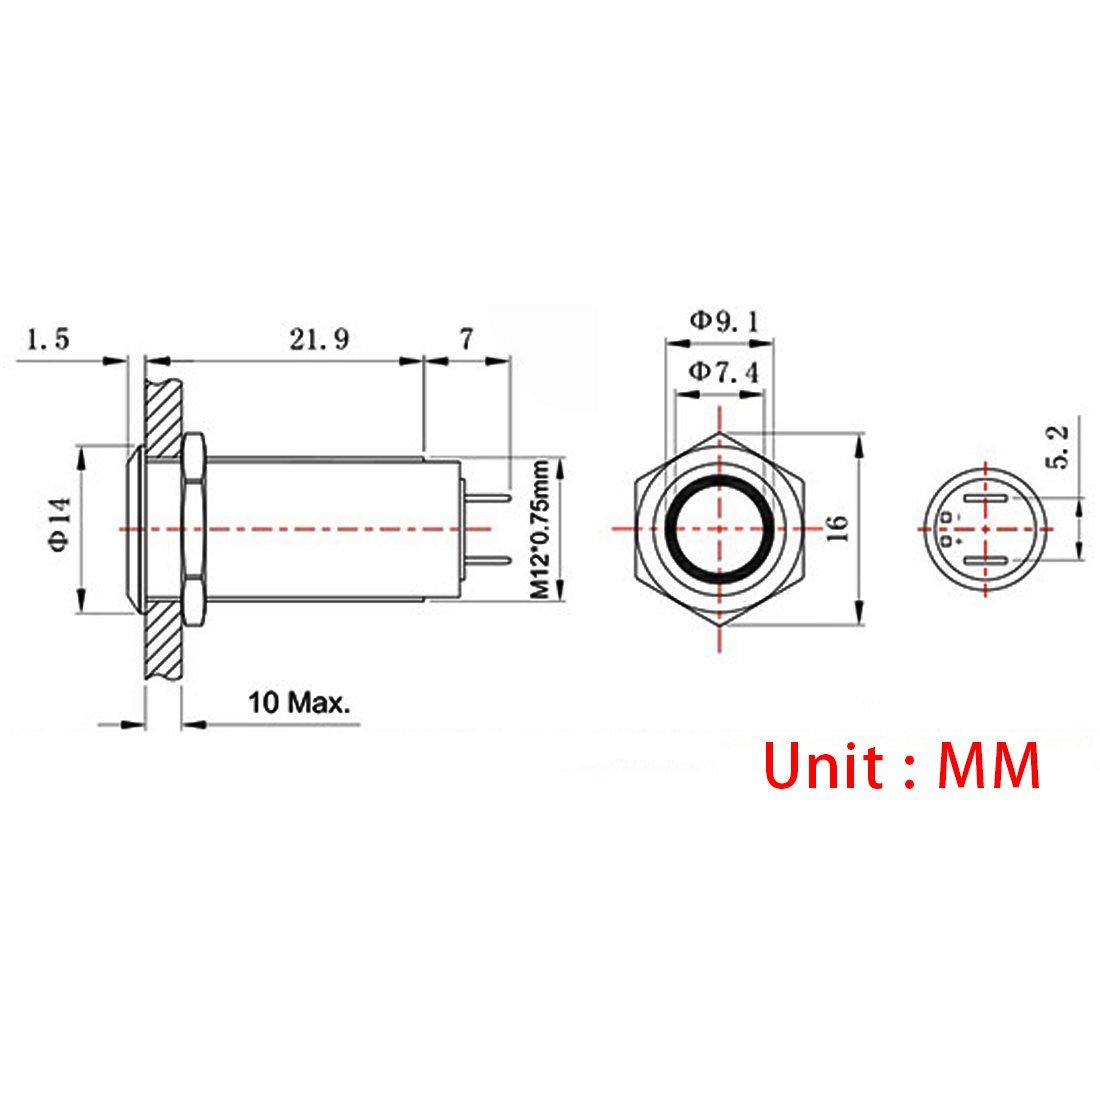 12mm,Azul Luz Larcele 5 piezas Impermeable No Moment/áneo Interruptor Mini Pestillo Interruptores Metal con Luz Indicadora JSANKG-02